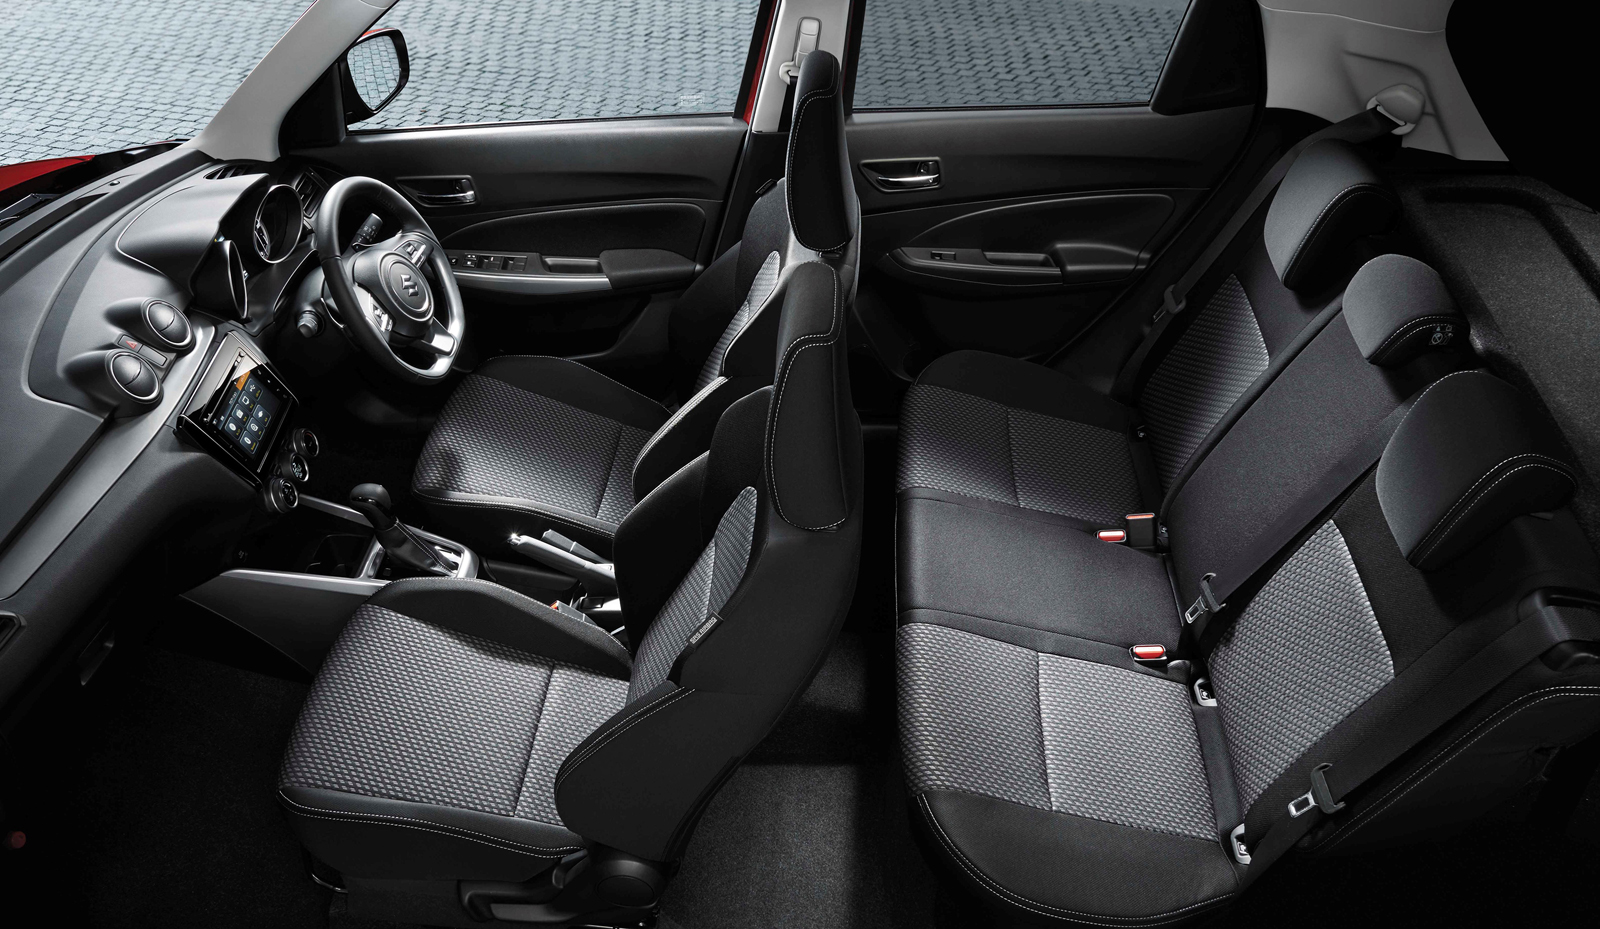 Suzuki Swift cabine